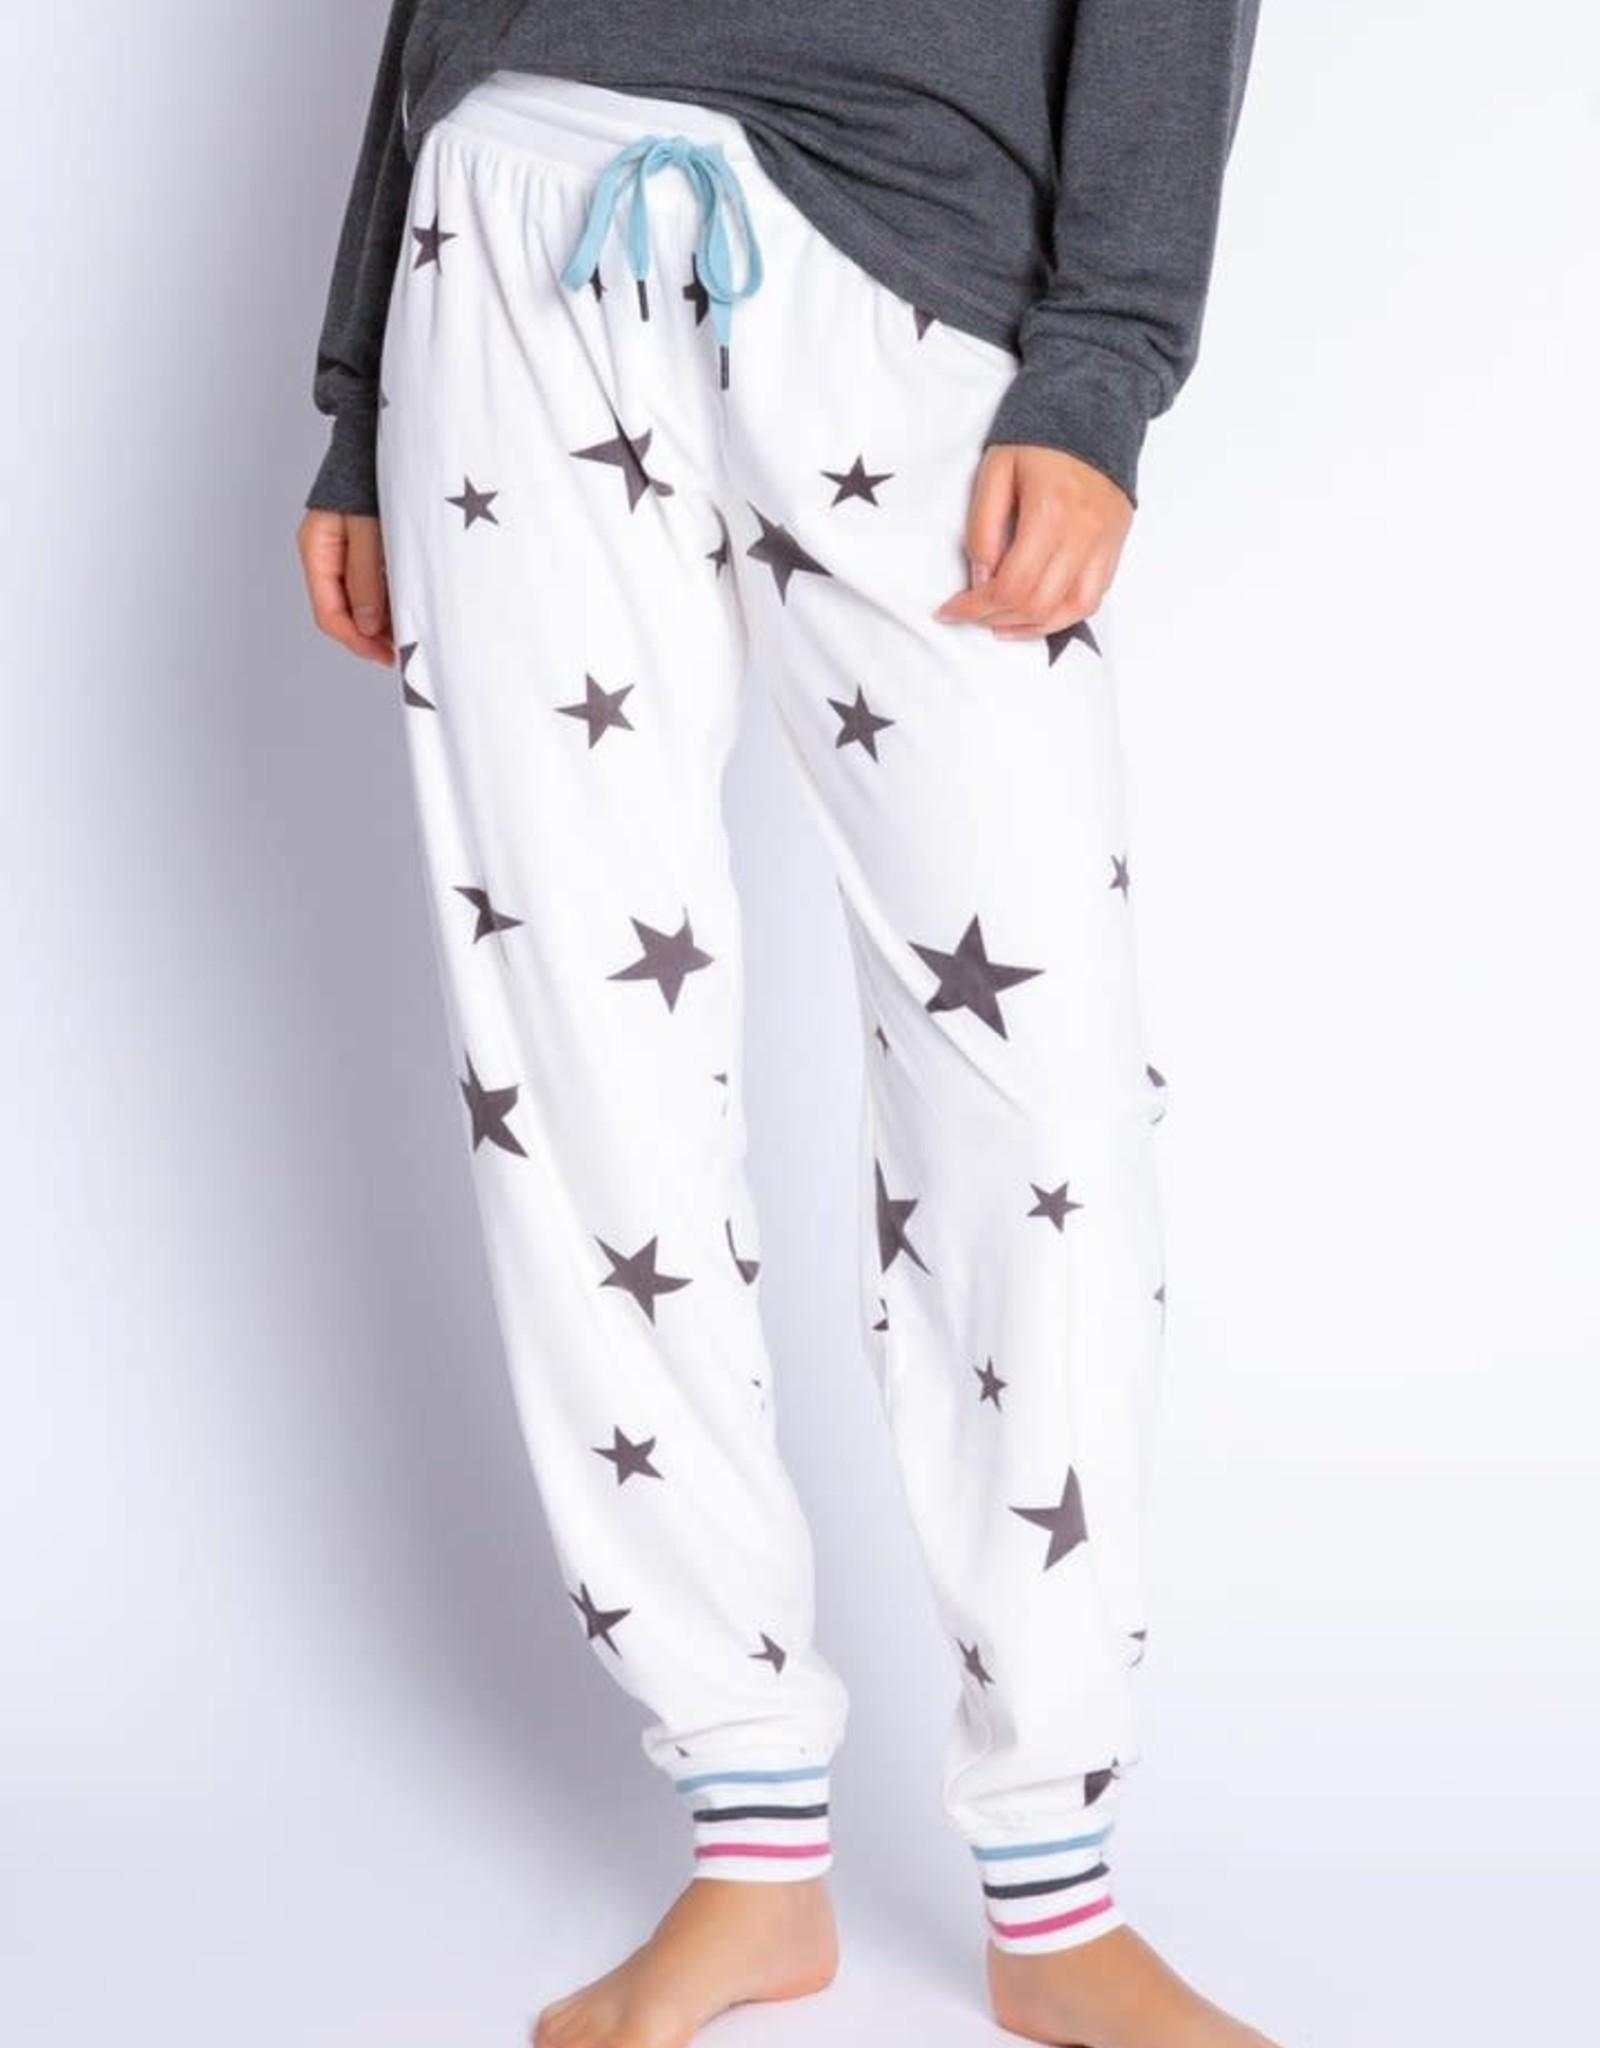 PJ Salvage Wishin' on a Star Lounge Pants